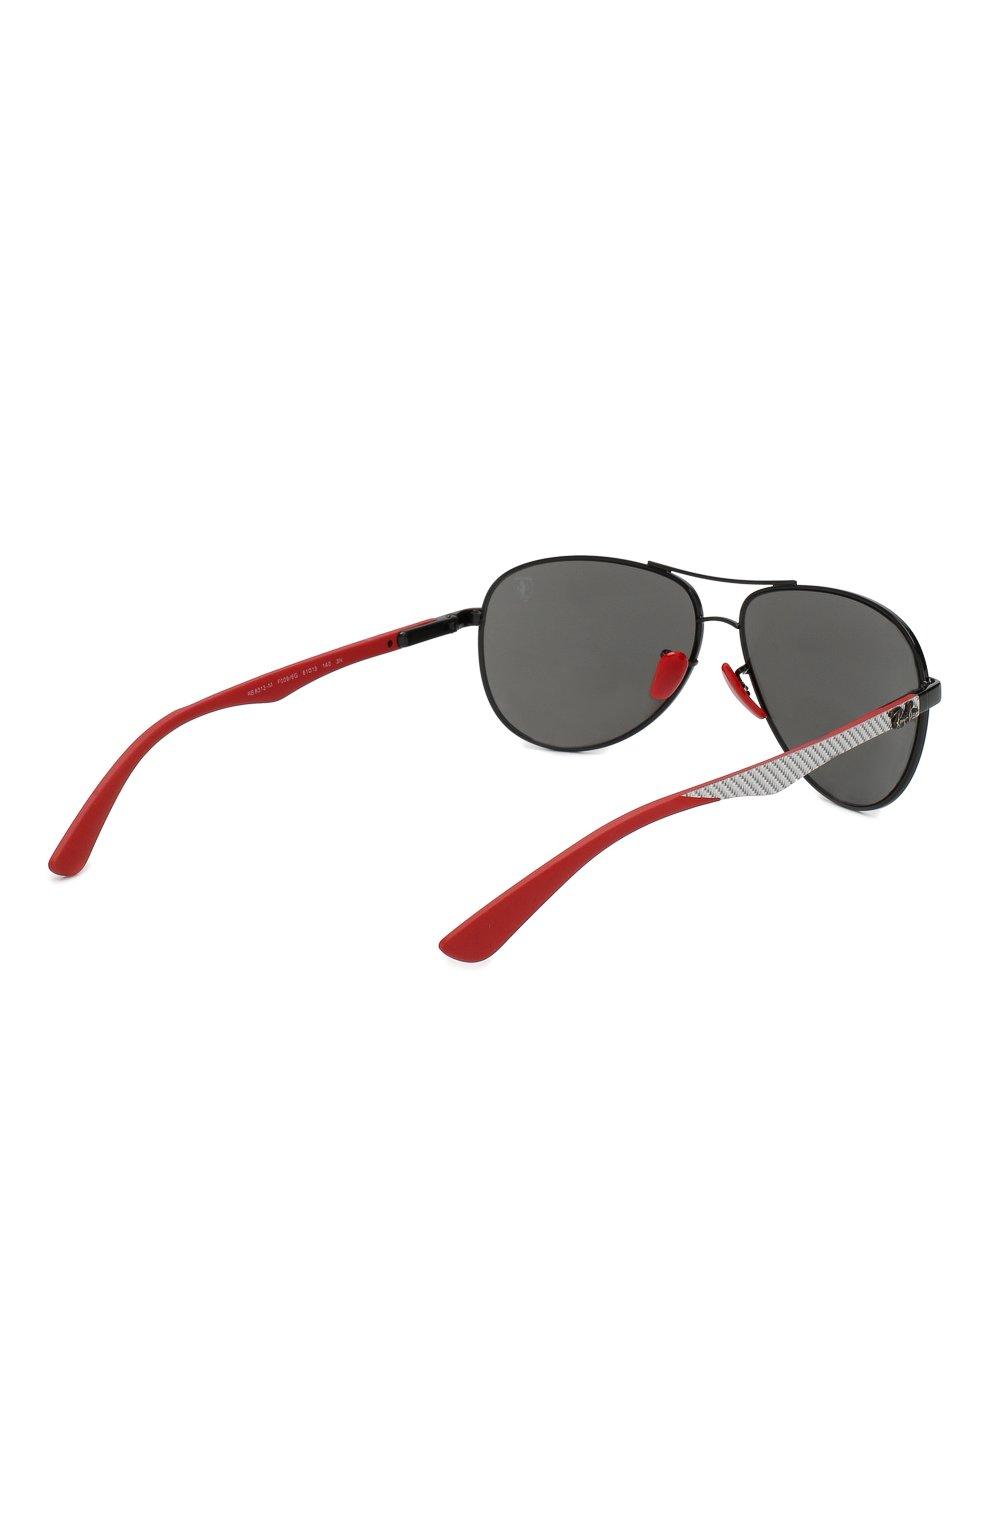 Мужские солнцезащитные очки RAY-BAN разноцветного цвета, арт. 8313M-F0096G | Фото 3